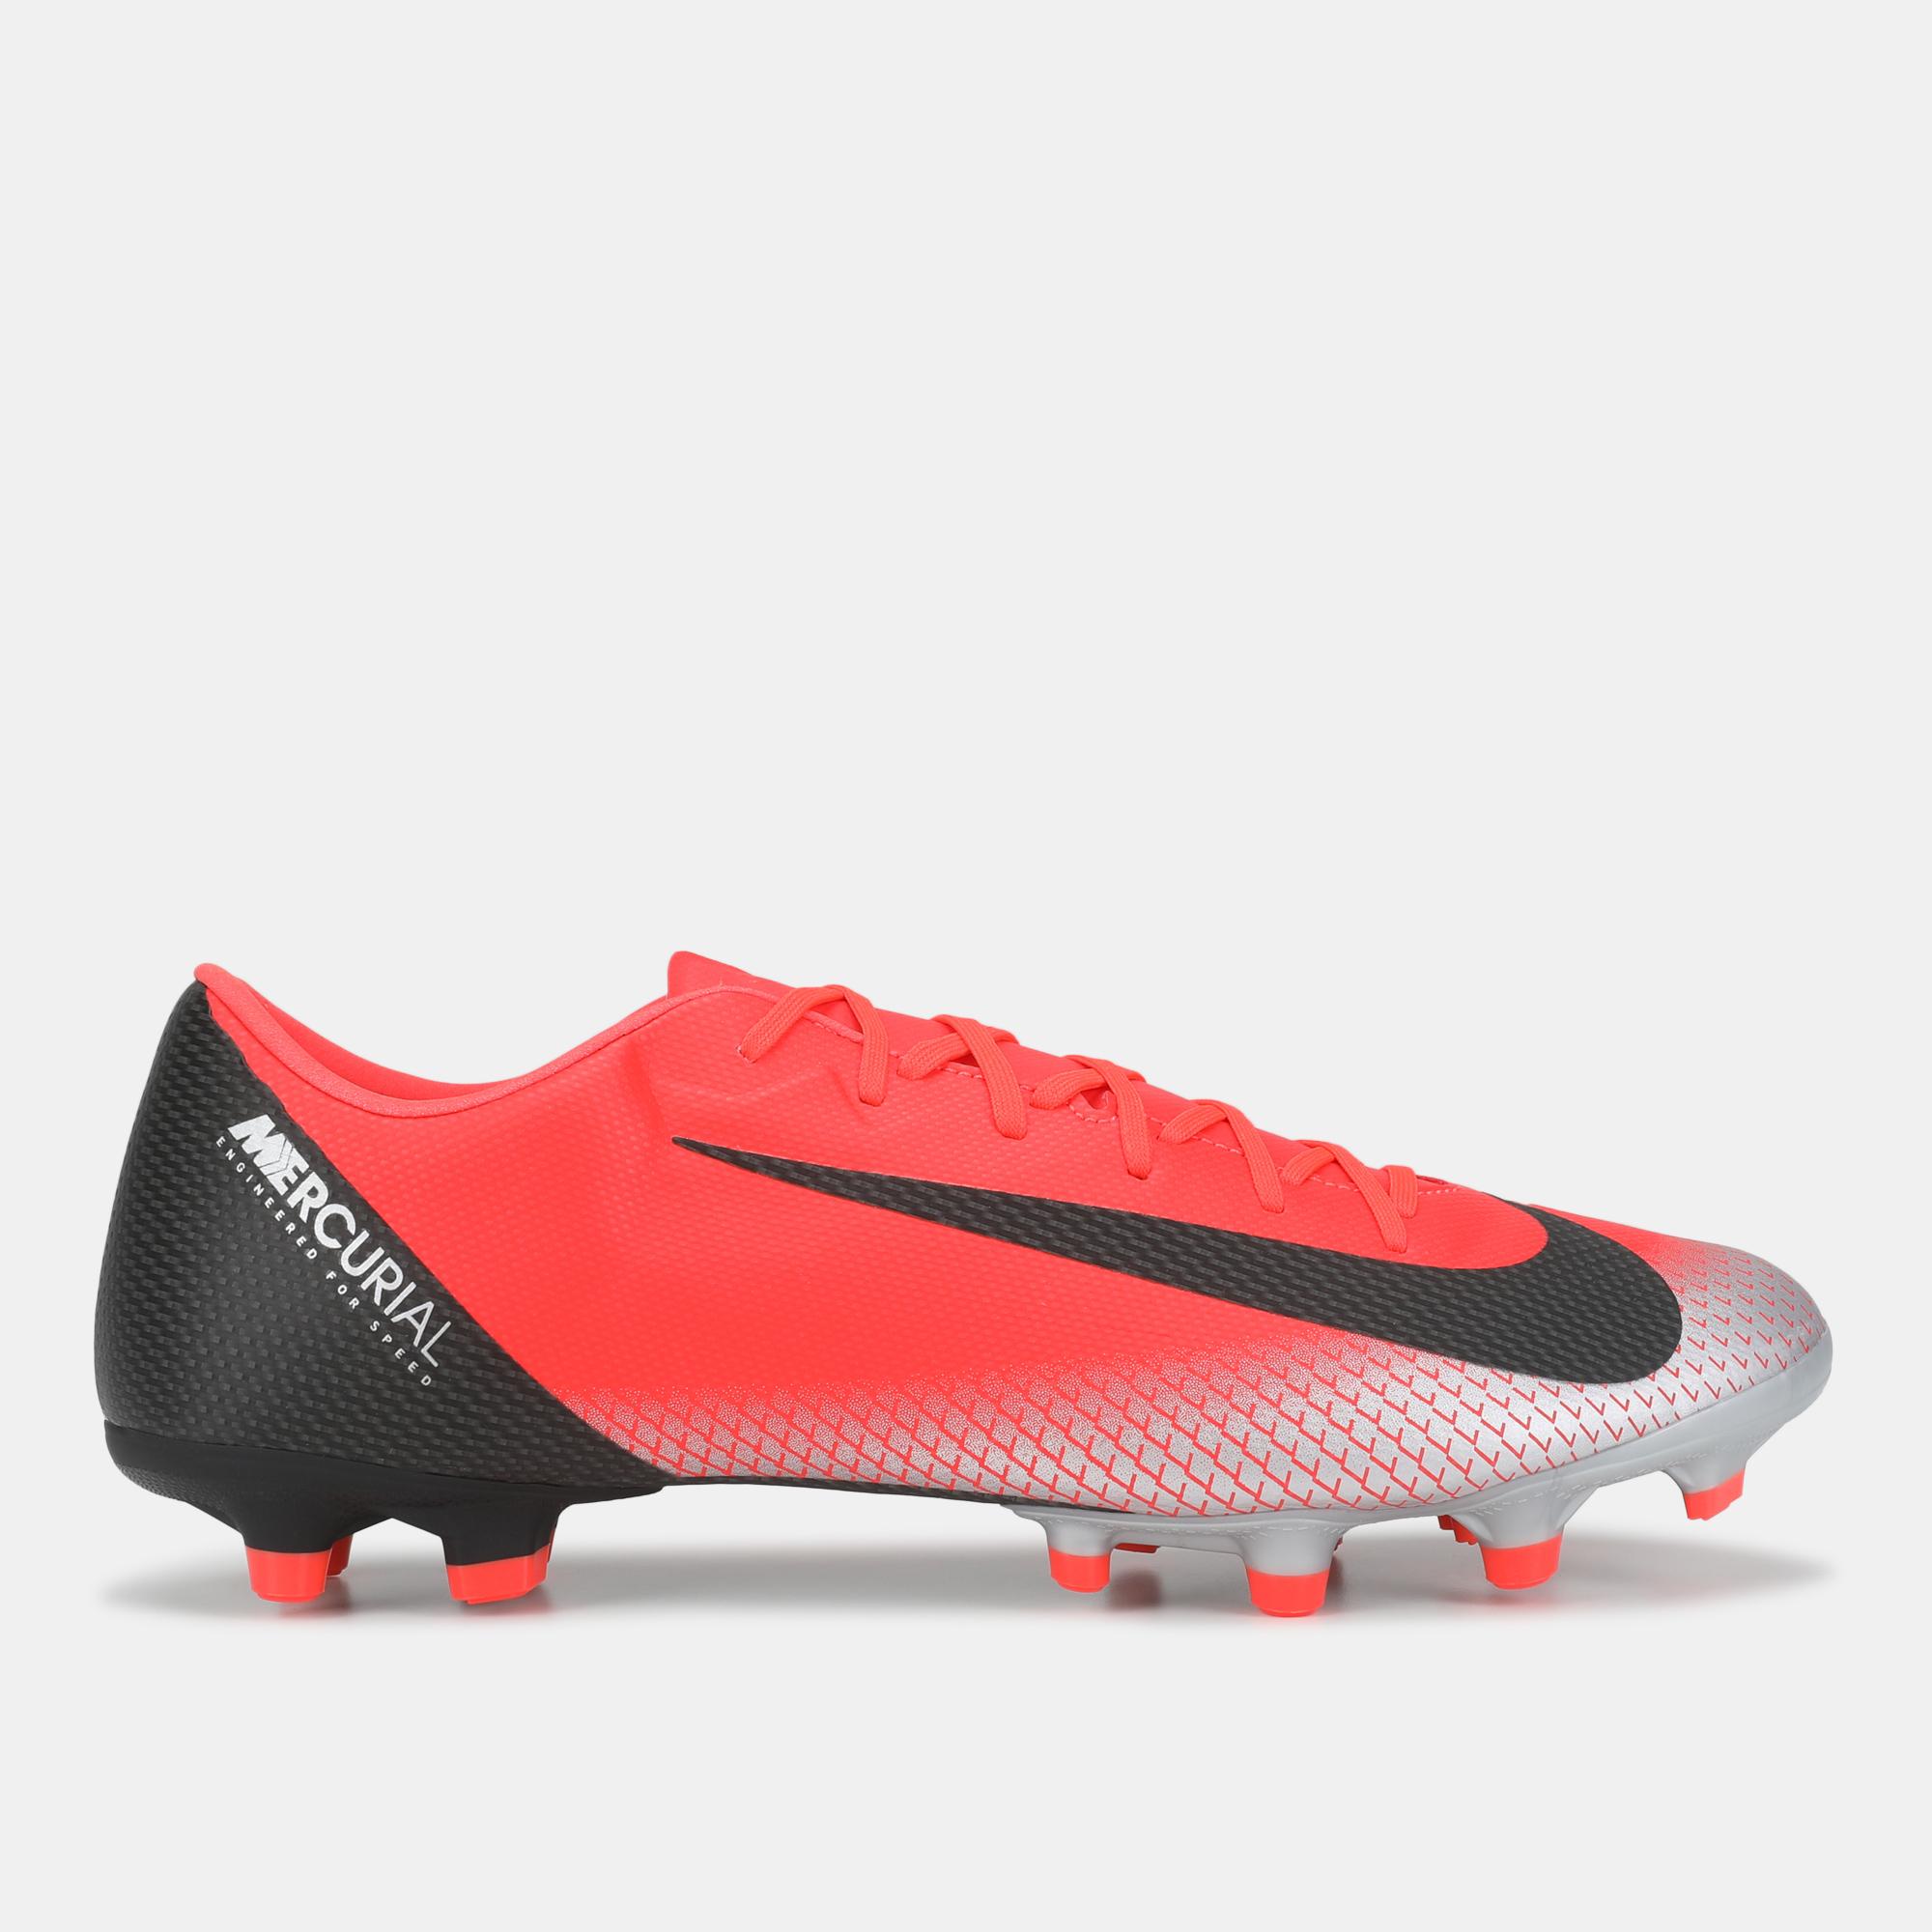 Nike Mercurial Vapor 12 Academy CR7 Multi-Ground Football Shoe